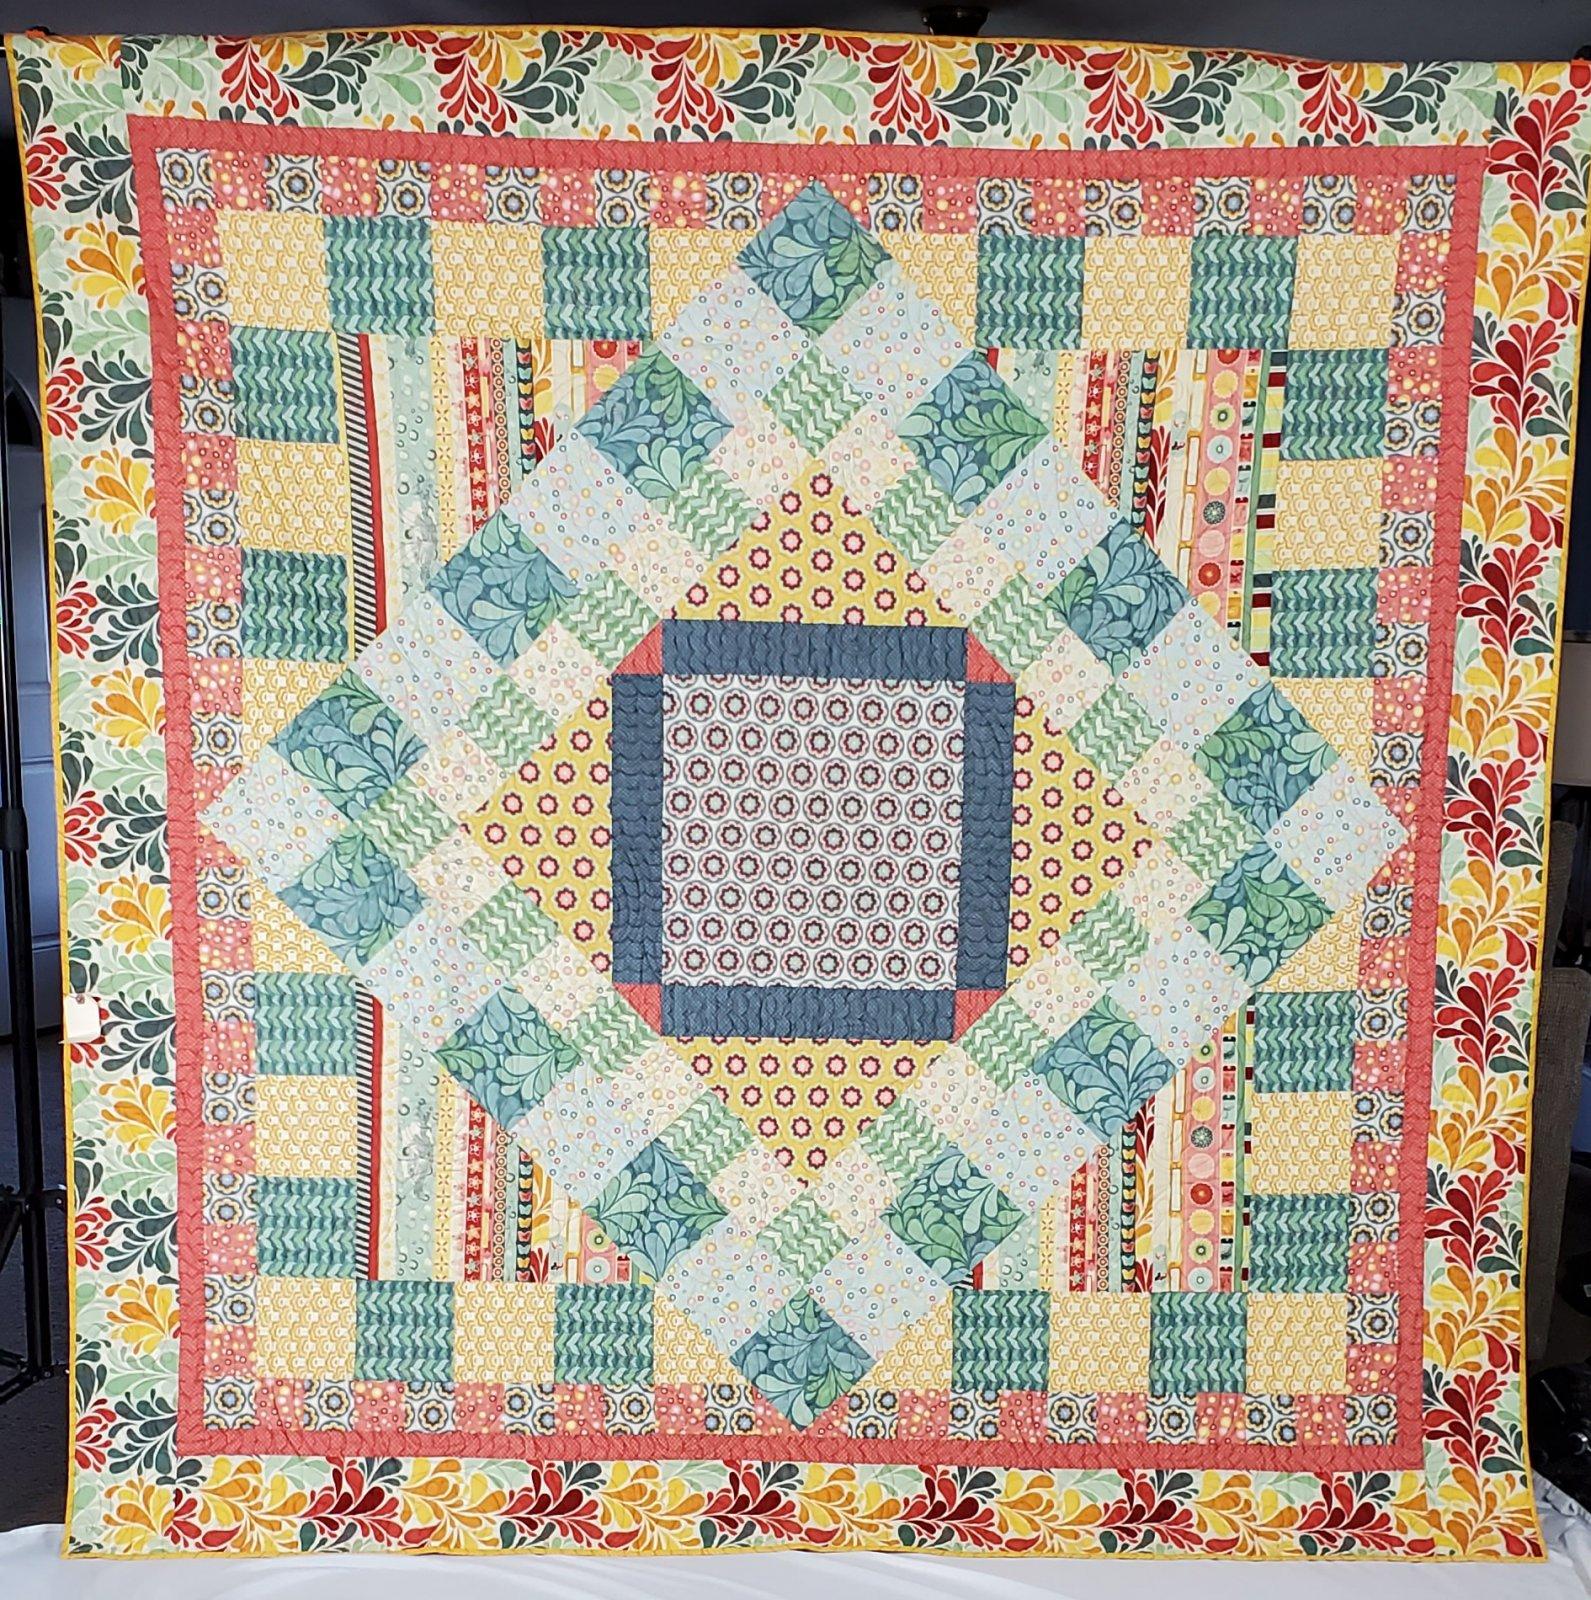 Salt Water quilt